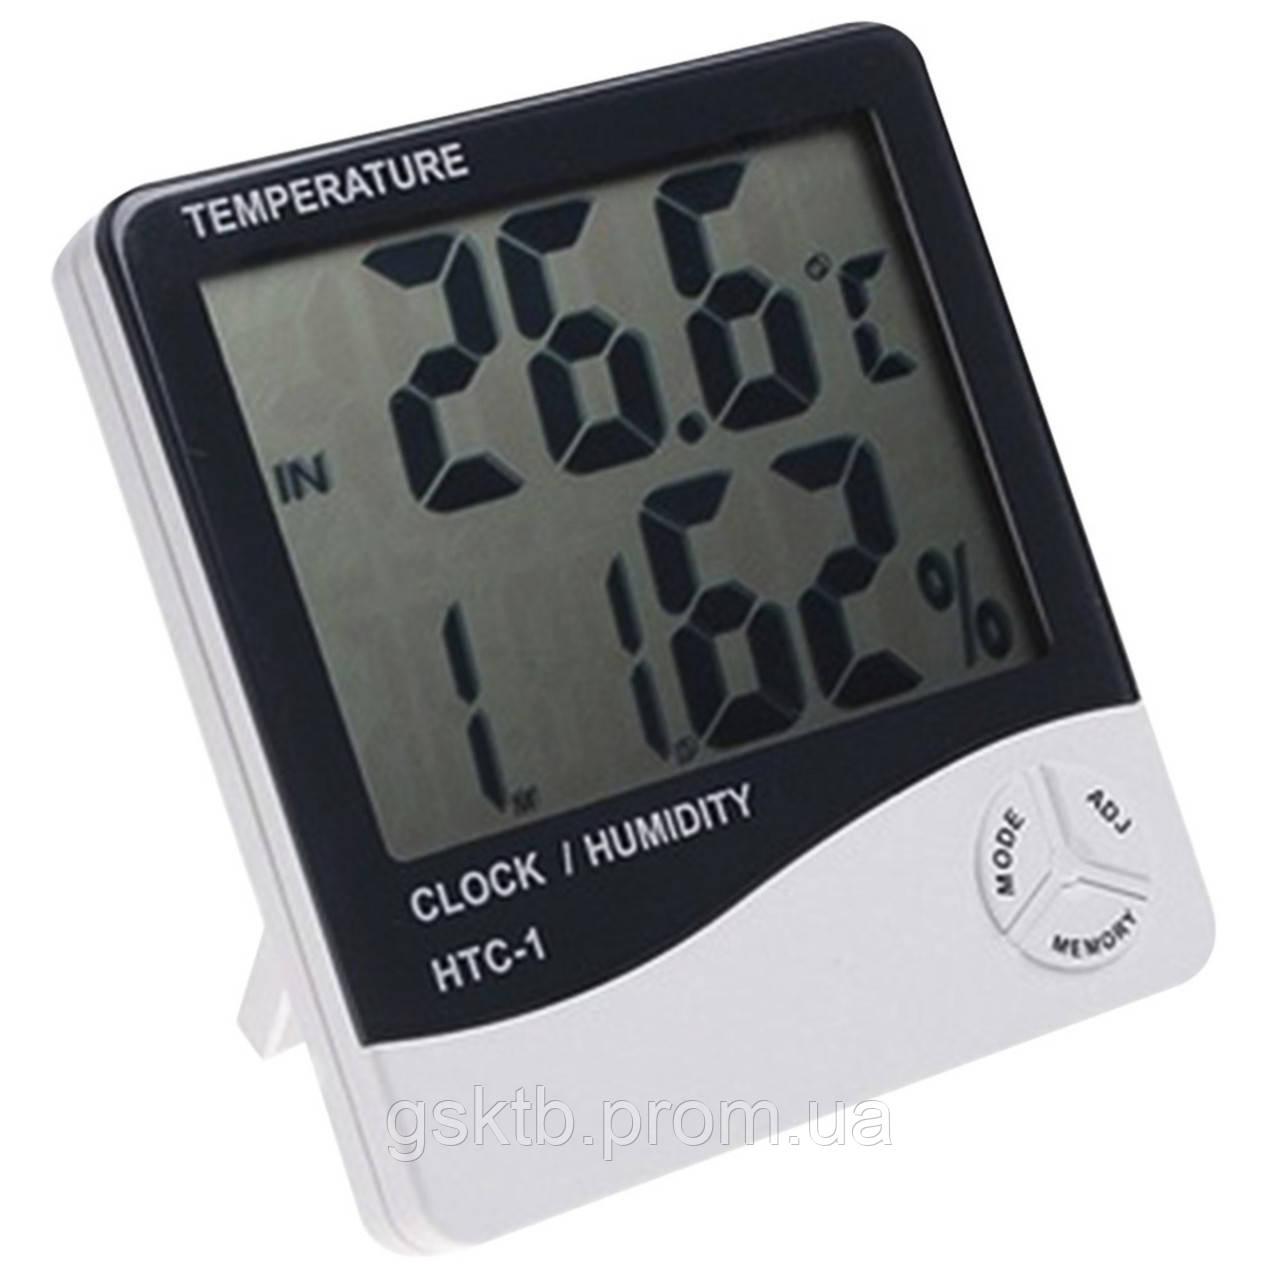 Термометр - гигрометр HTC-1